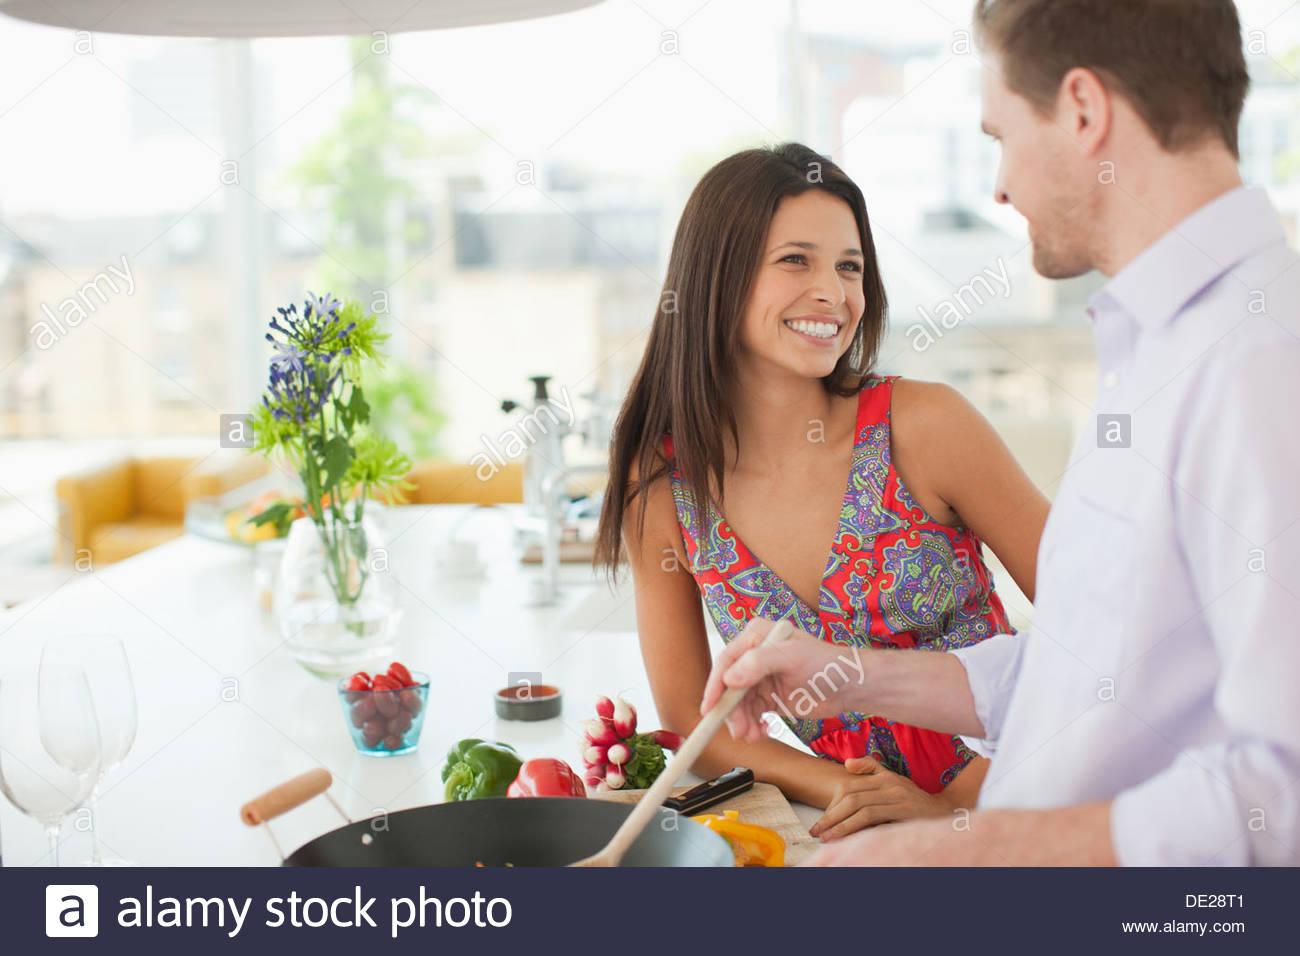 Beobachtete Mann Frau spiegeln hineinschütten in der Küche Stockbild